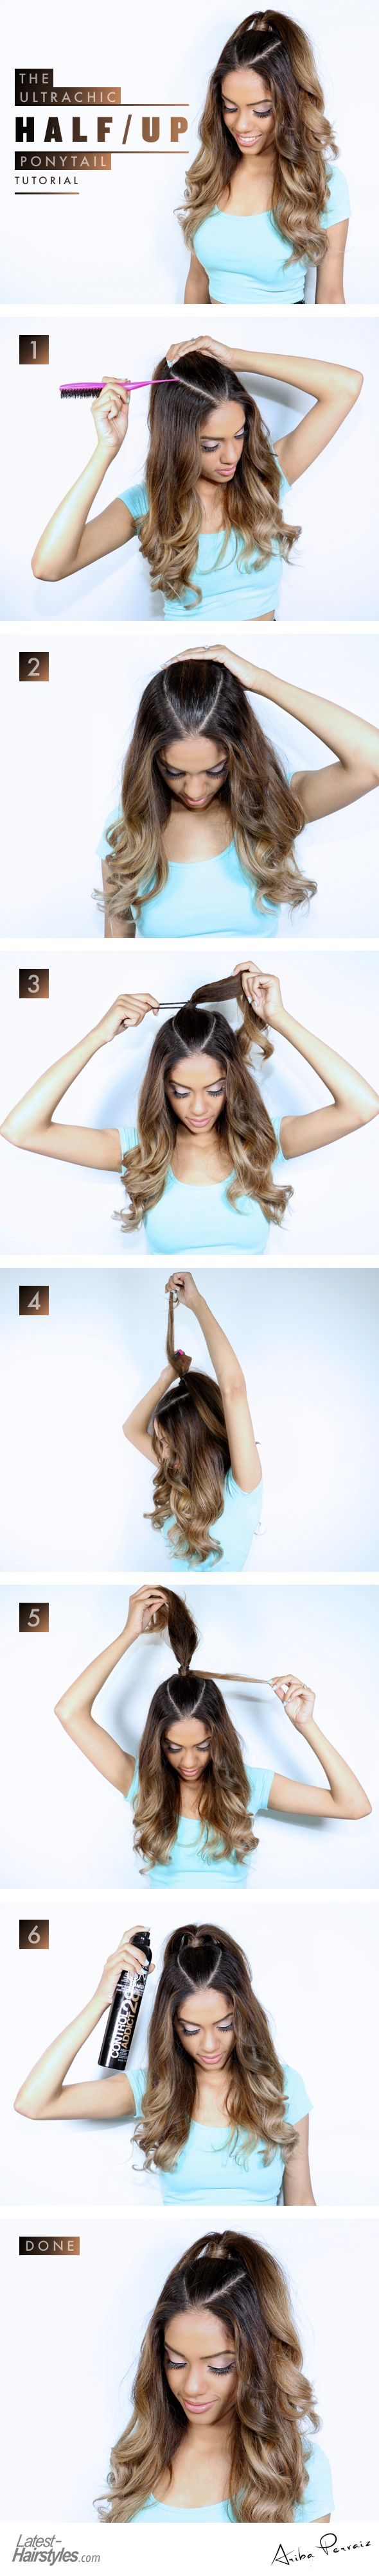 21 best peinados images on Pinterest